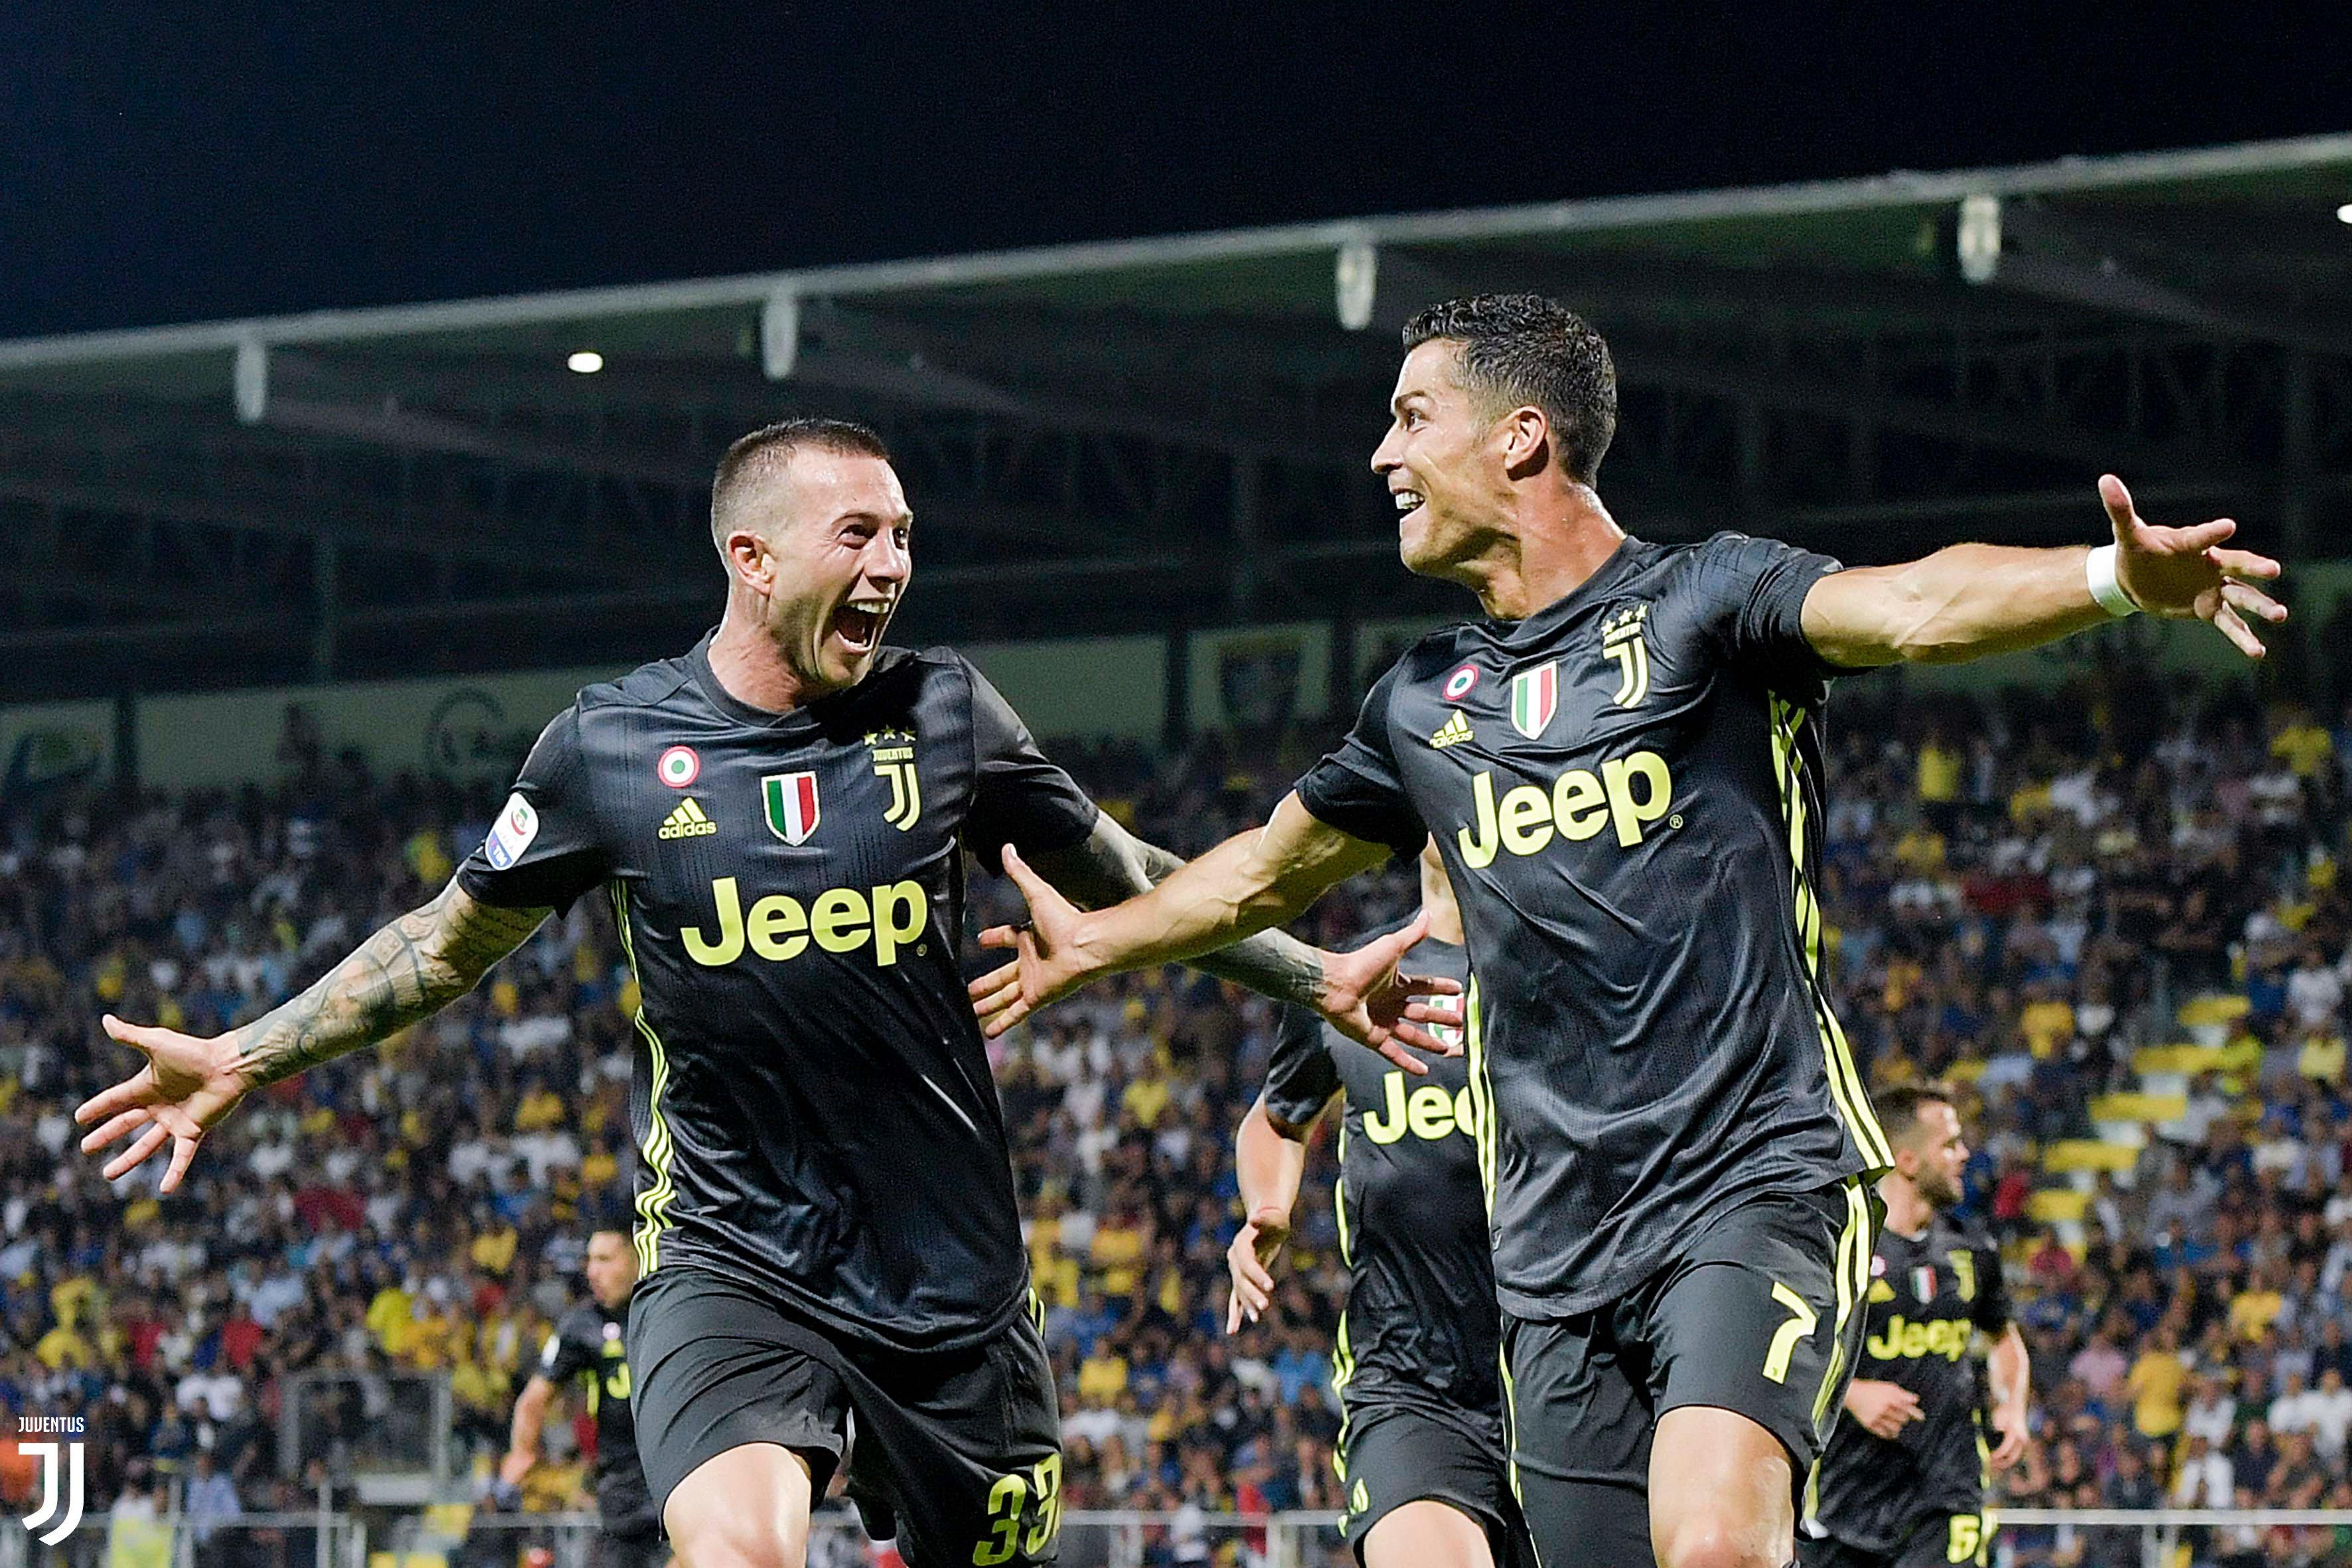 Allegri Praises Ronaldo's Winning Mentality In Juve's Win Vs Frosinone